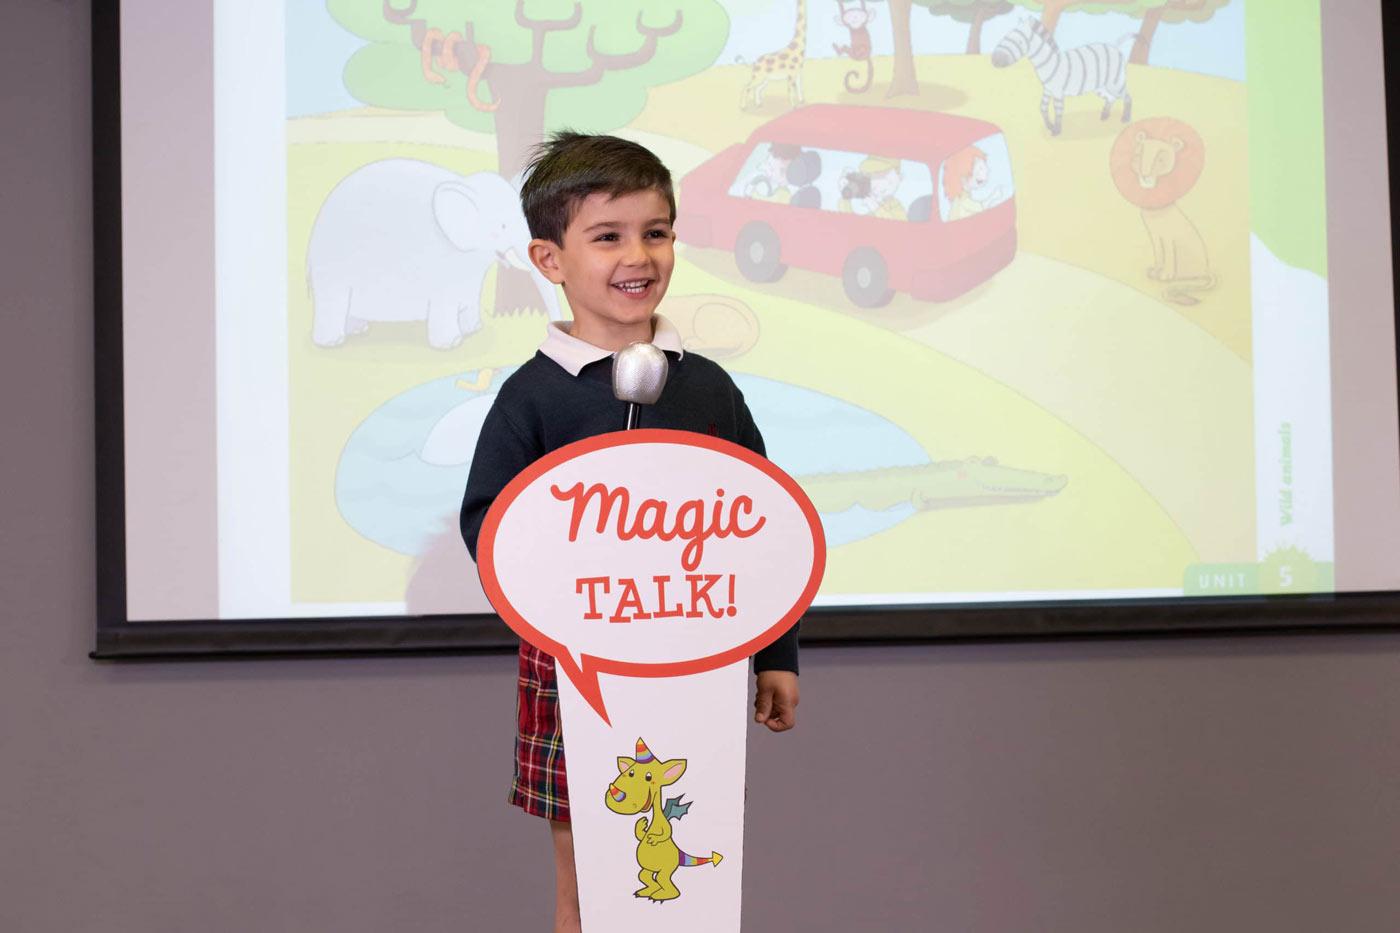 MAGIC-TALK-2-scaled